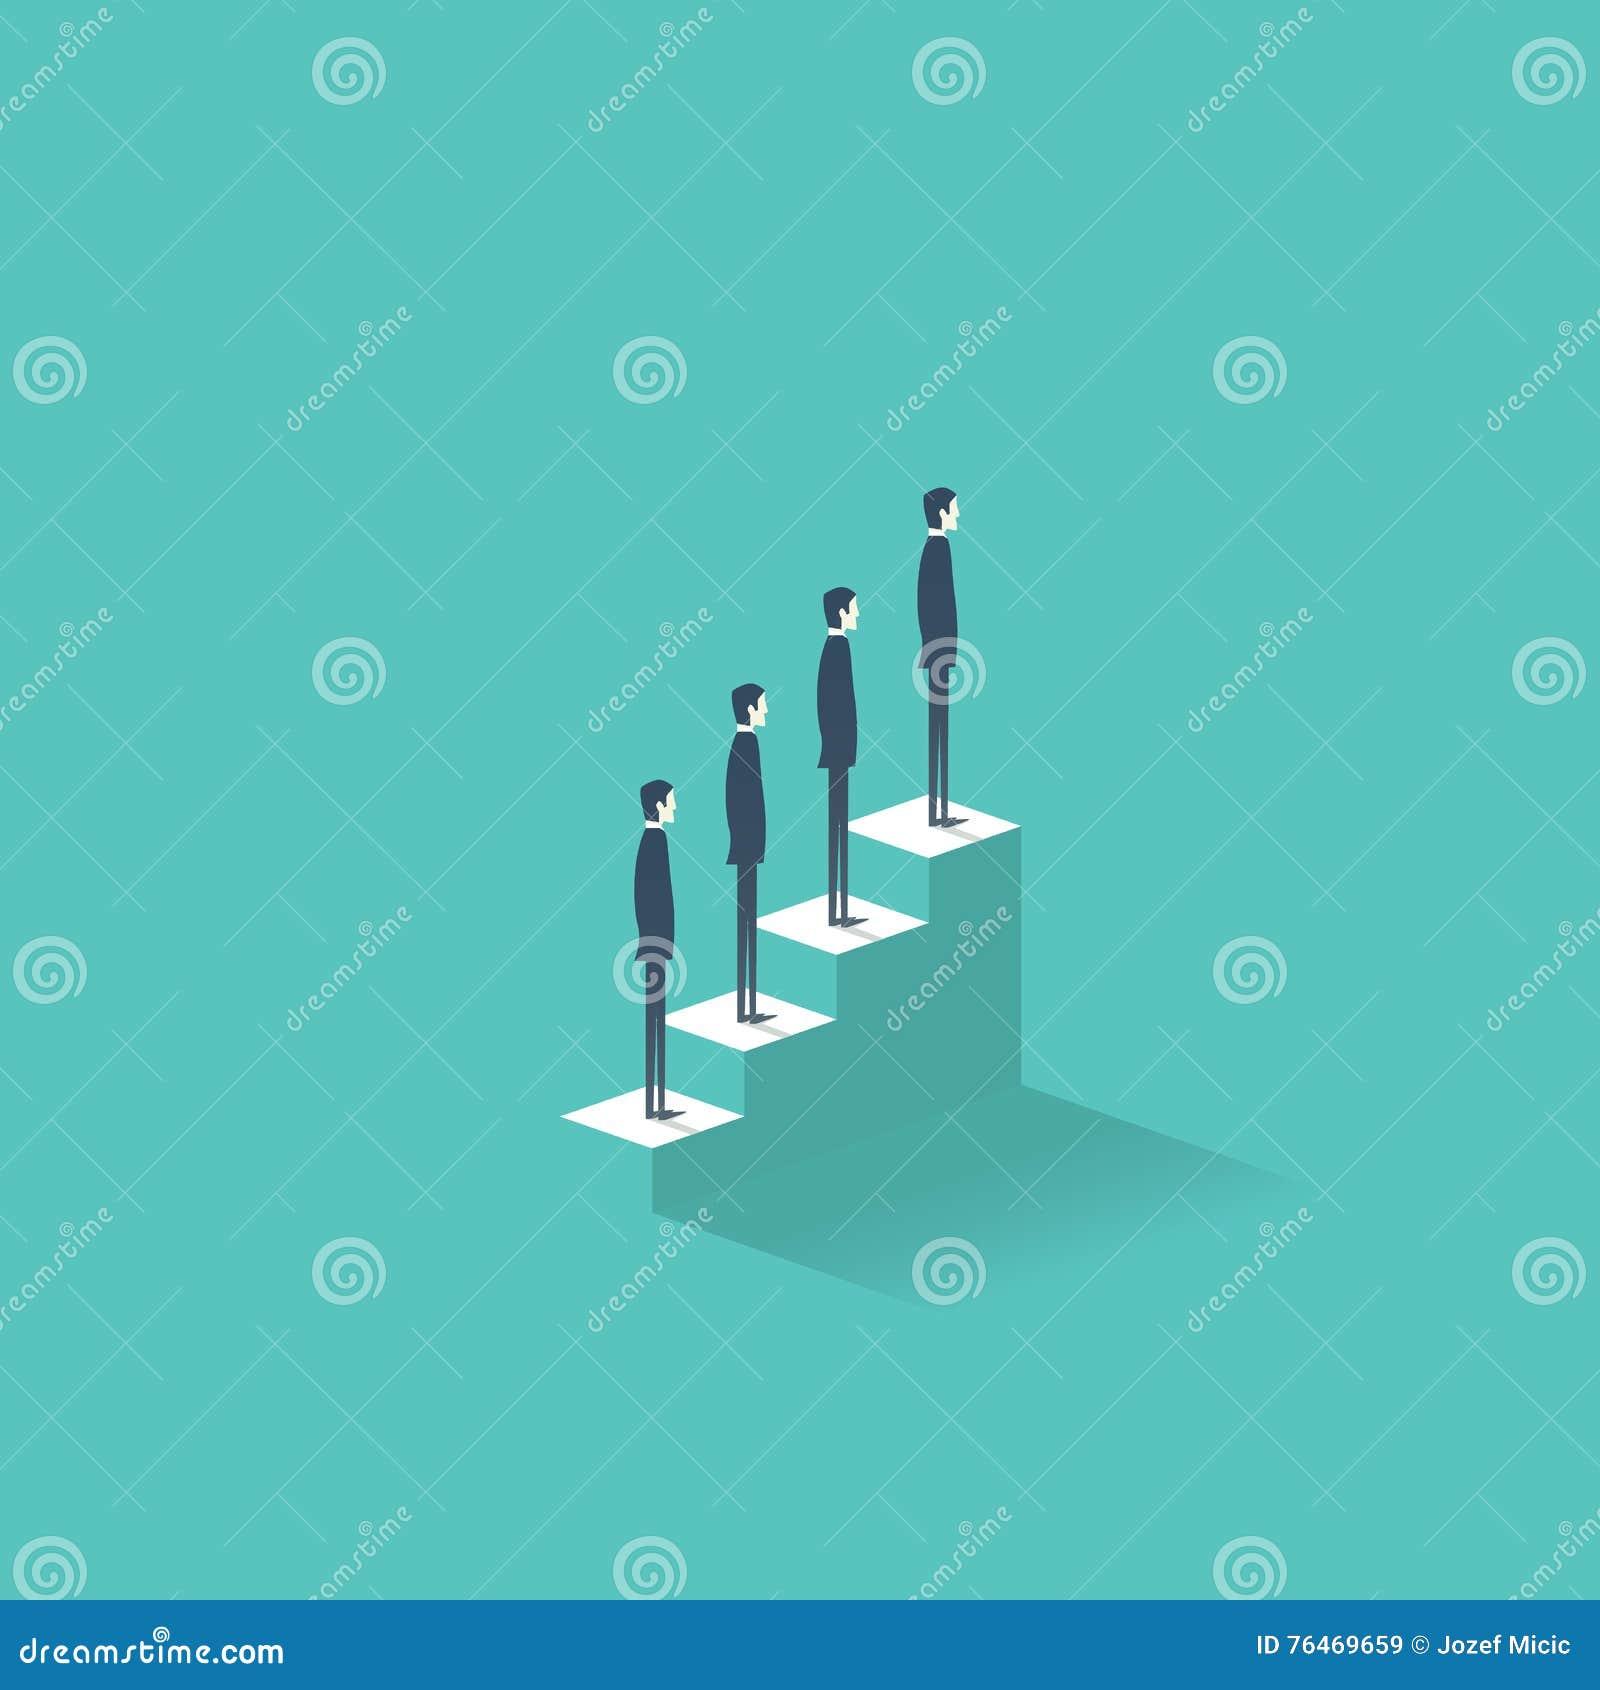 career growth vector illustration concept business people career growth vector illustration concept business people standing on stairs to the top job